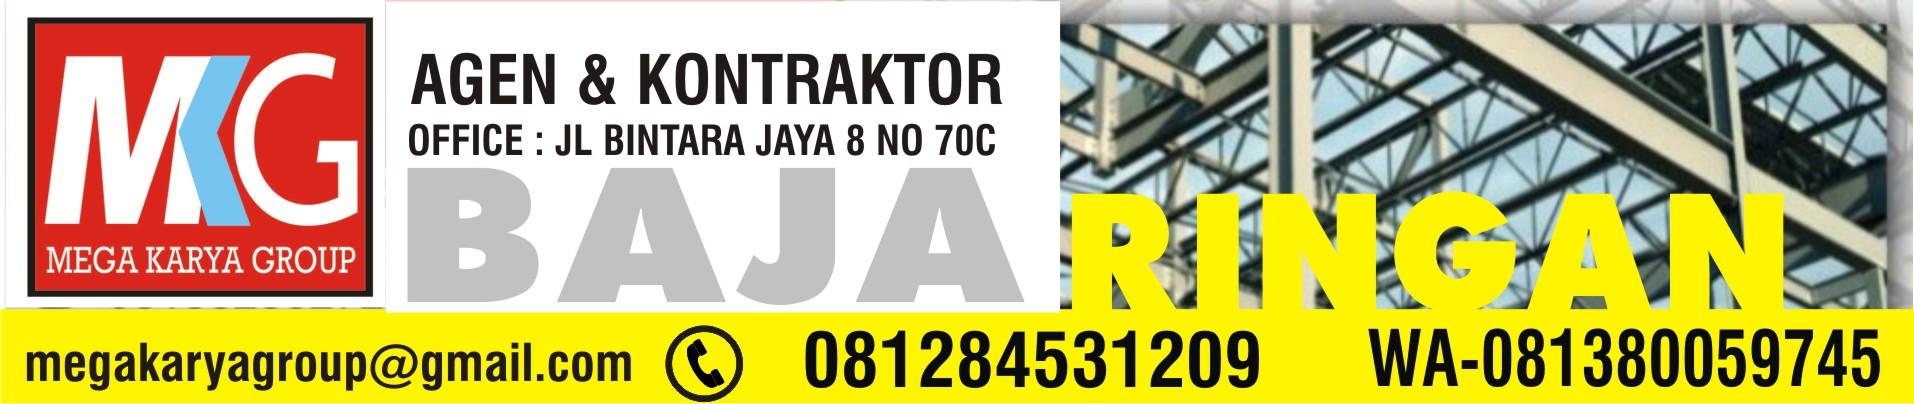 harga baja ringan bekas kontraktor toko distributor agen supplier rangka konstruksi